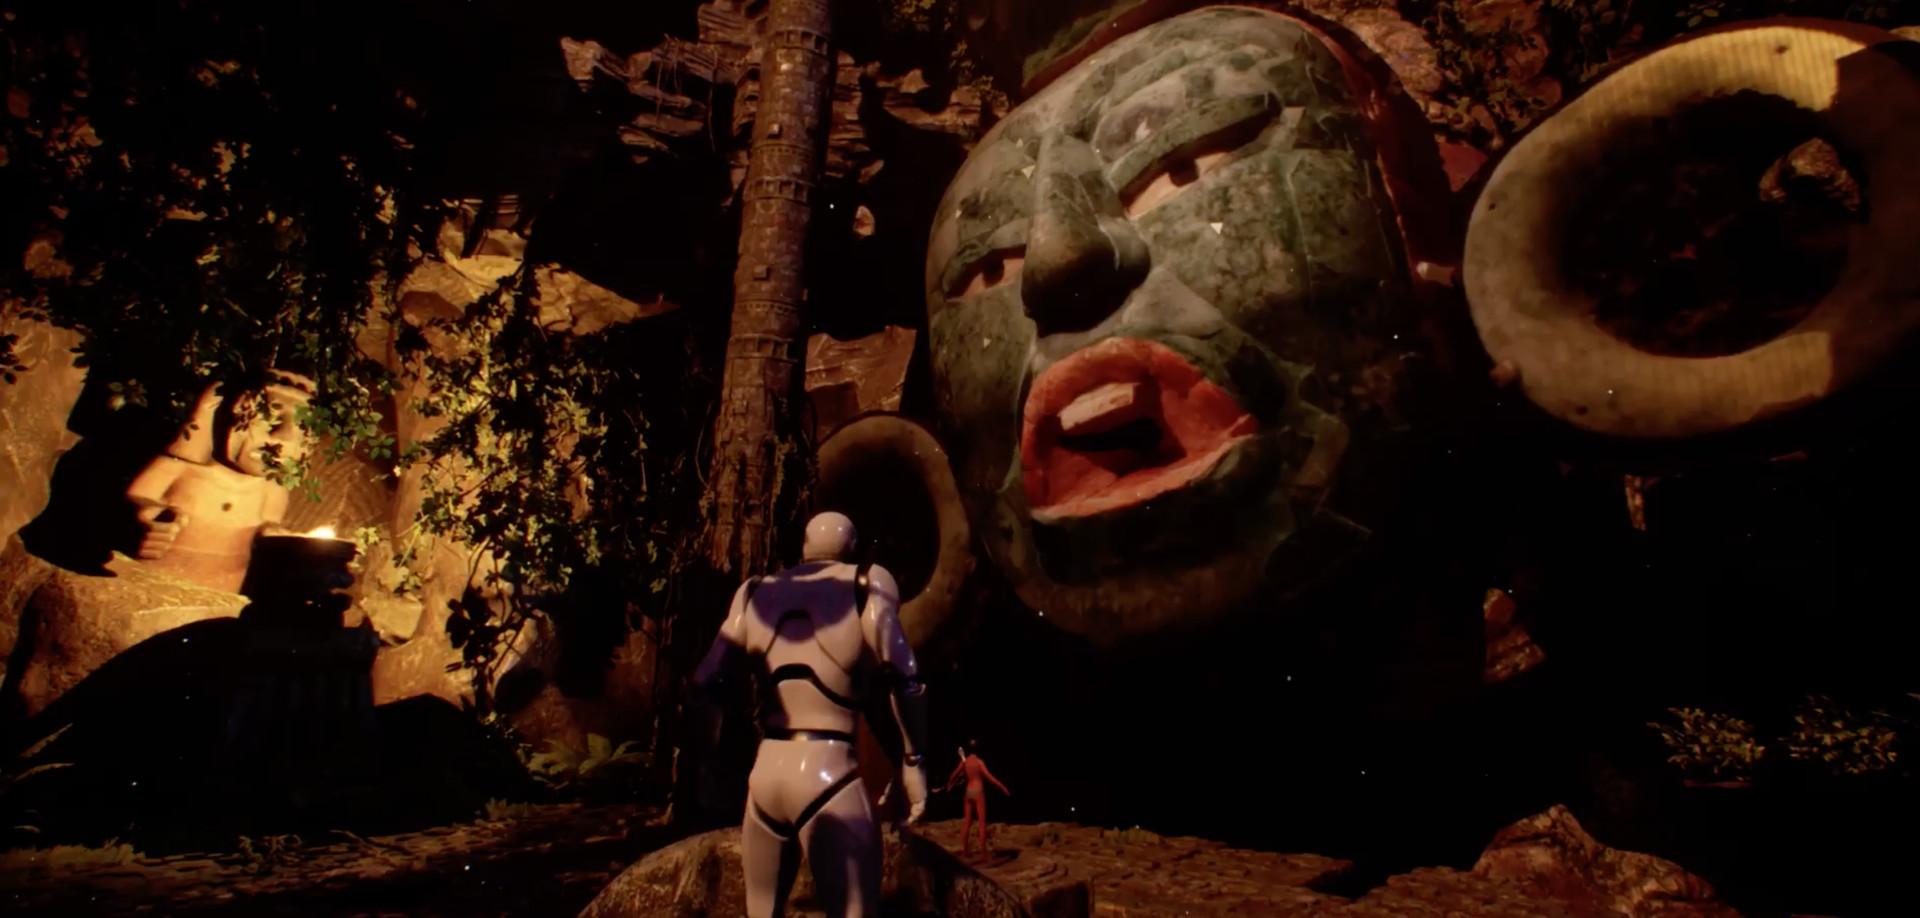 Mictlan: An Ancient Mythical Tale en Steam